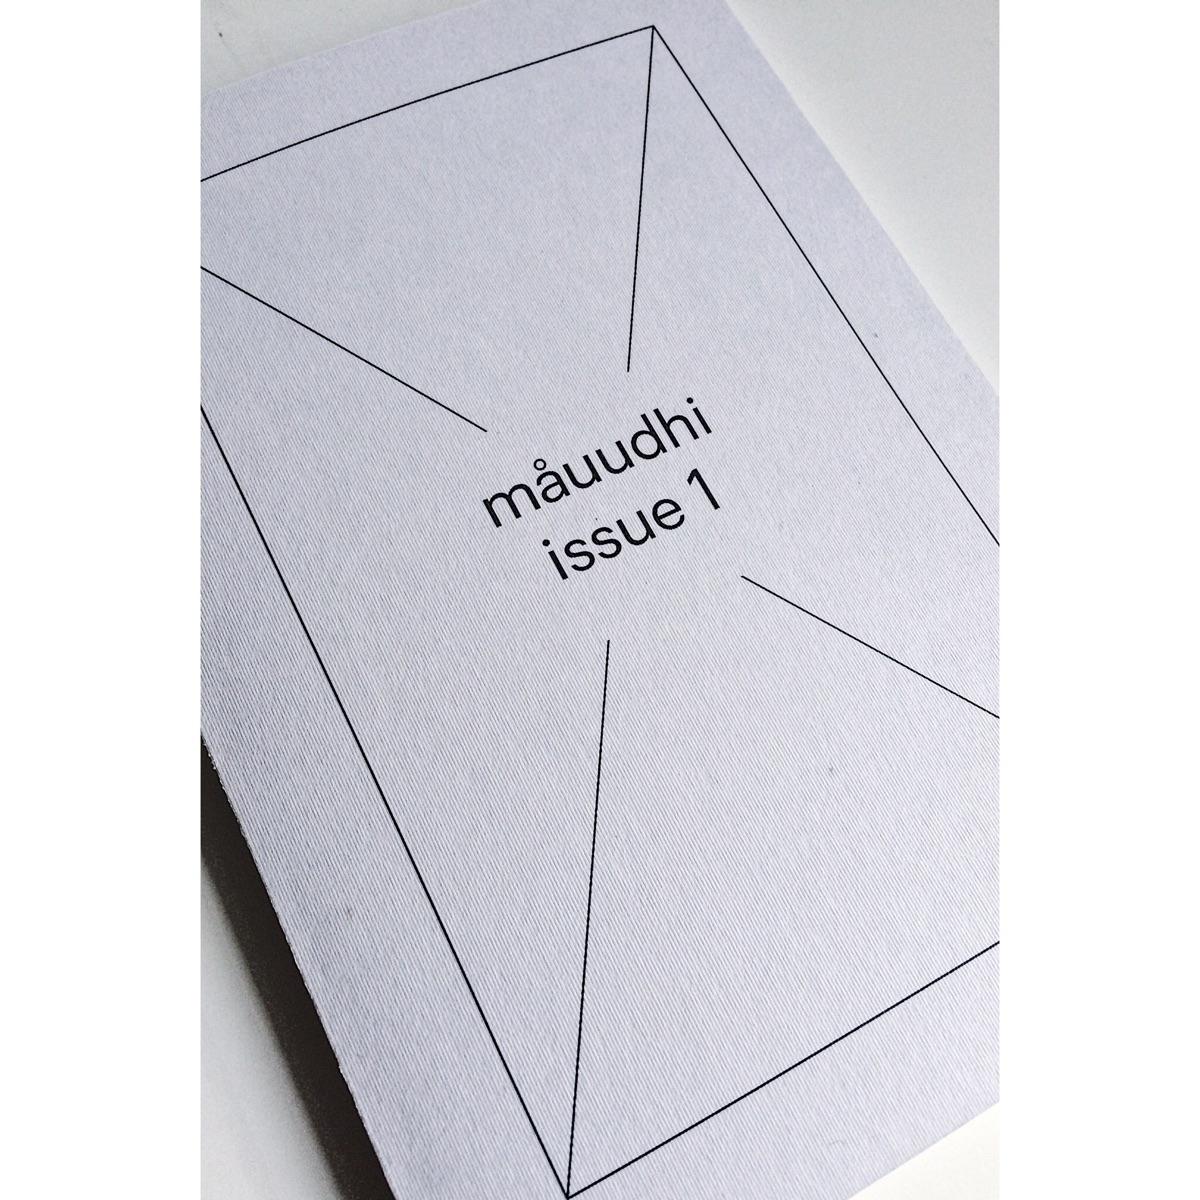 Coming - mauudhi, issueone, magazine - mauudhi | ello